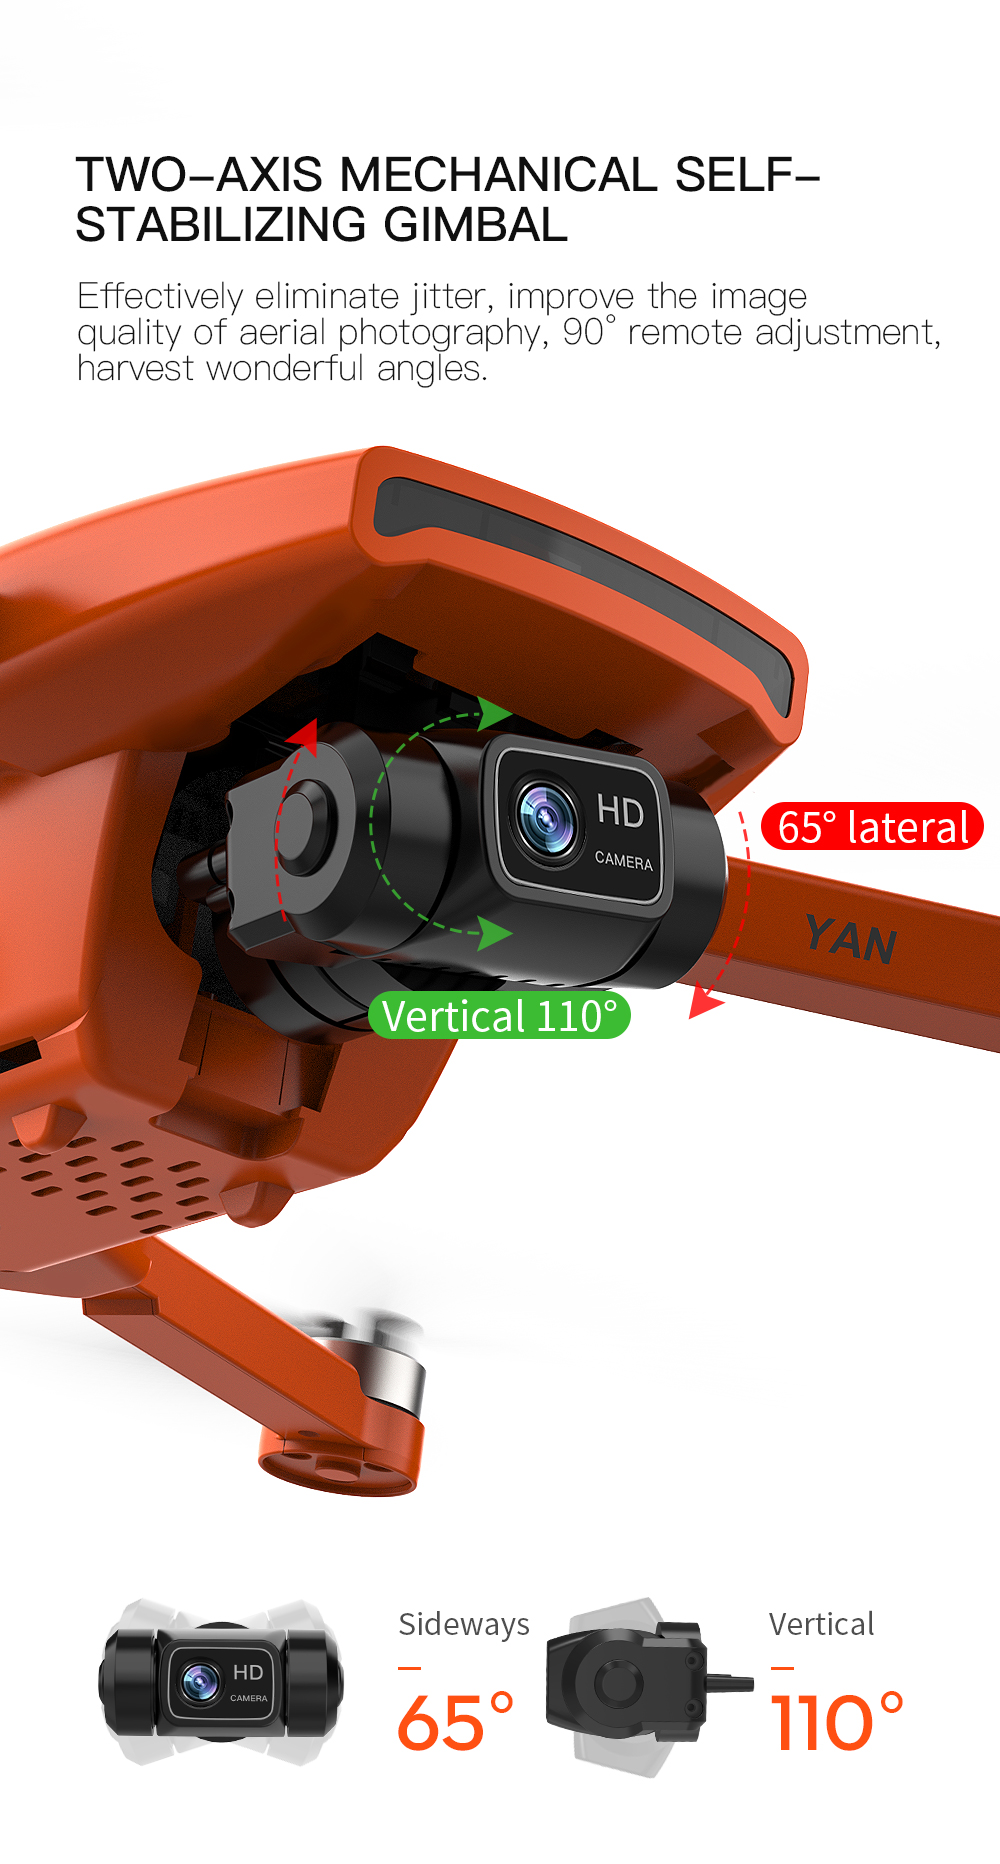 H33d0c10421d649cb9fcf0c61f46681fdE - ZLL SG108 Pro GPS Drone With 5G Wifi FPV 4K HD Dual Camera Brushless RC Foldable Quadcopter 1000m Control Distance Dron VS KF102